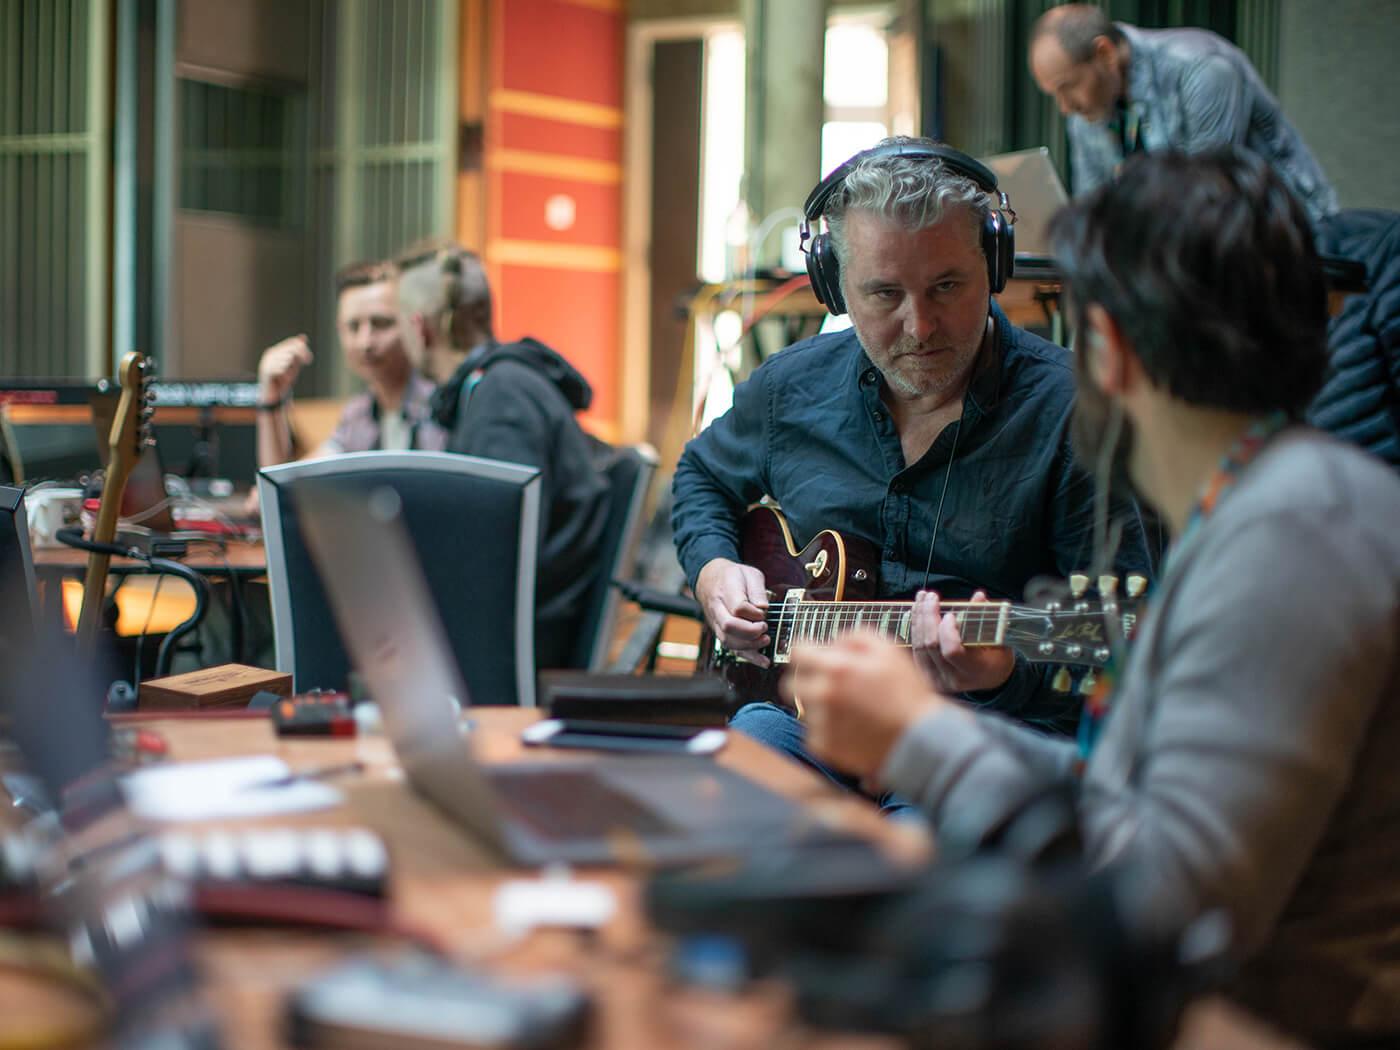 Graham Kearns, Real World Studios